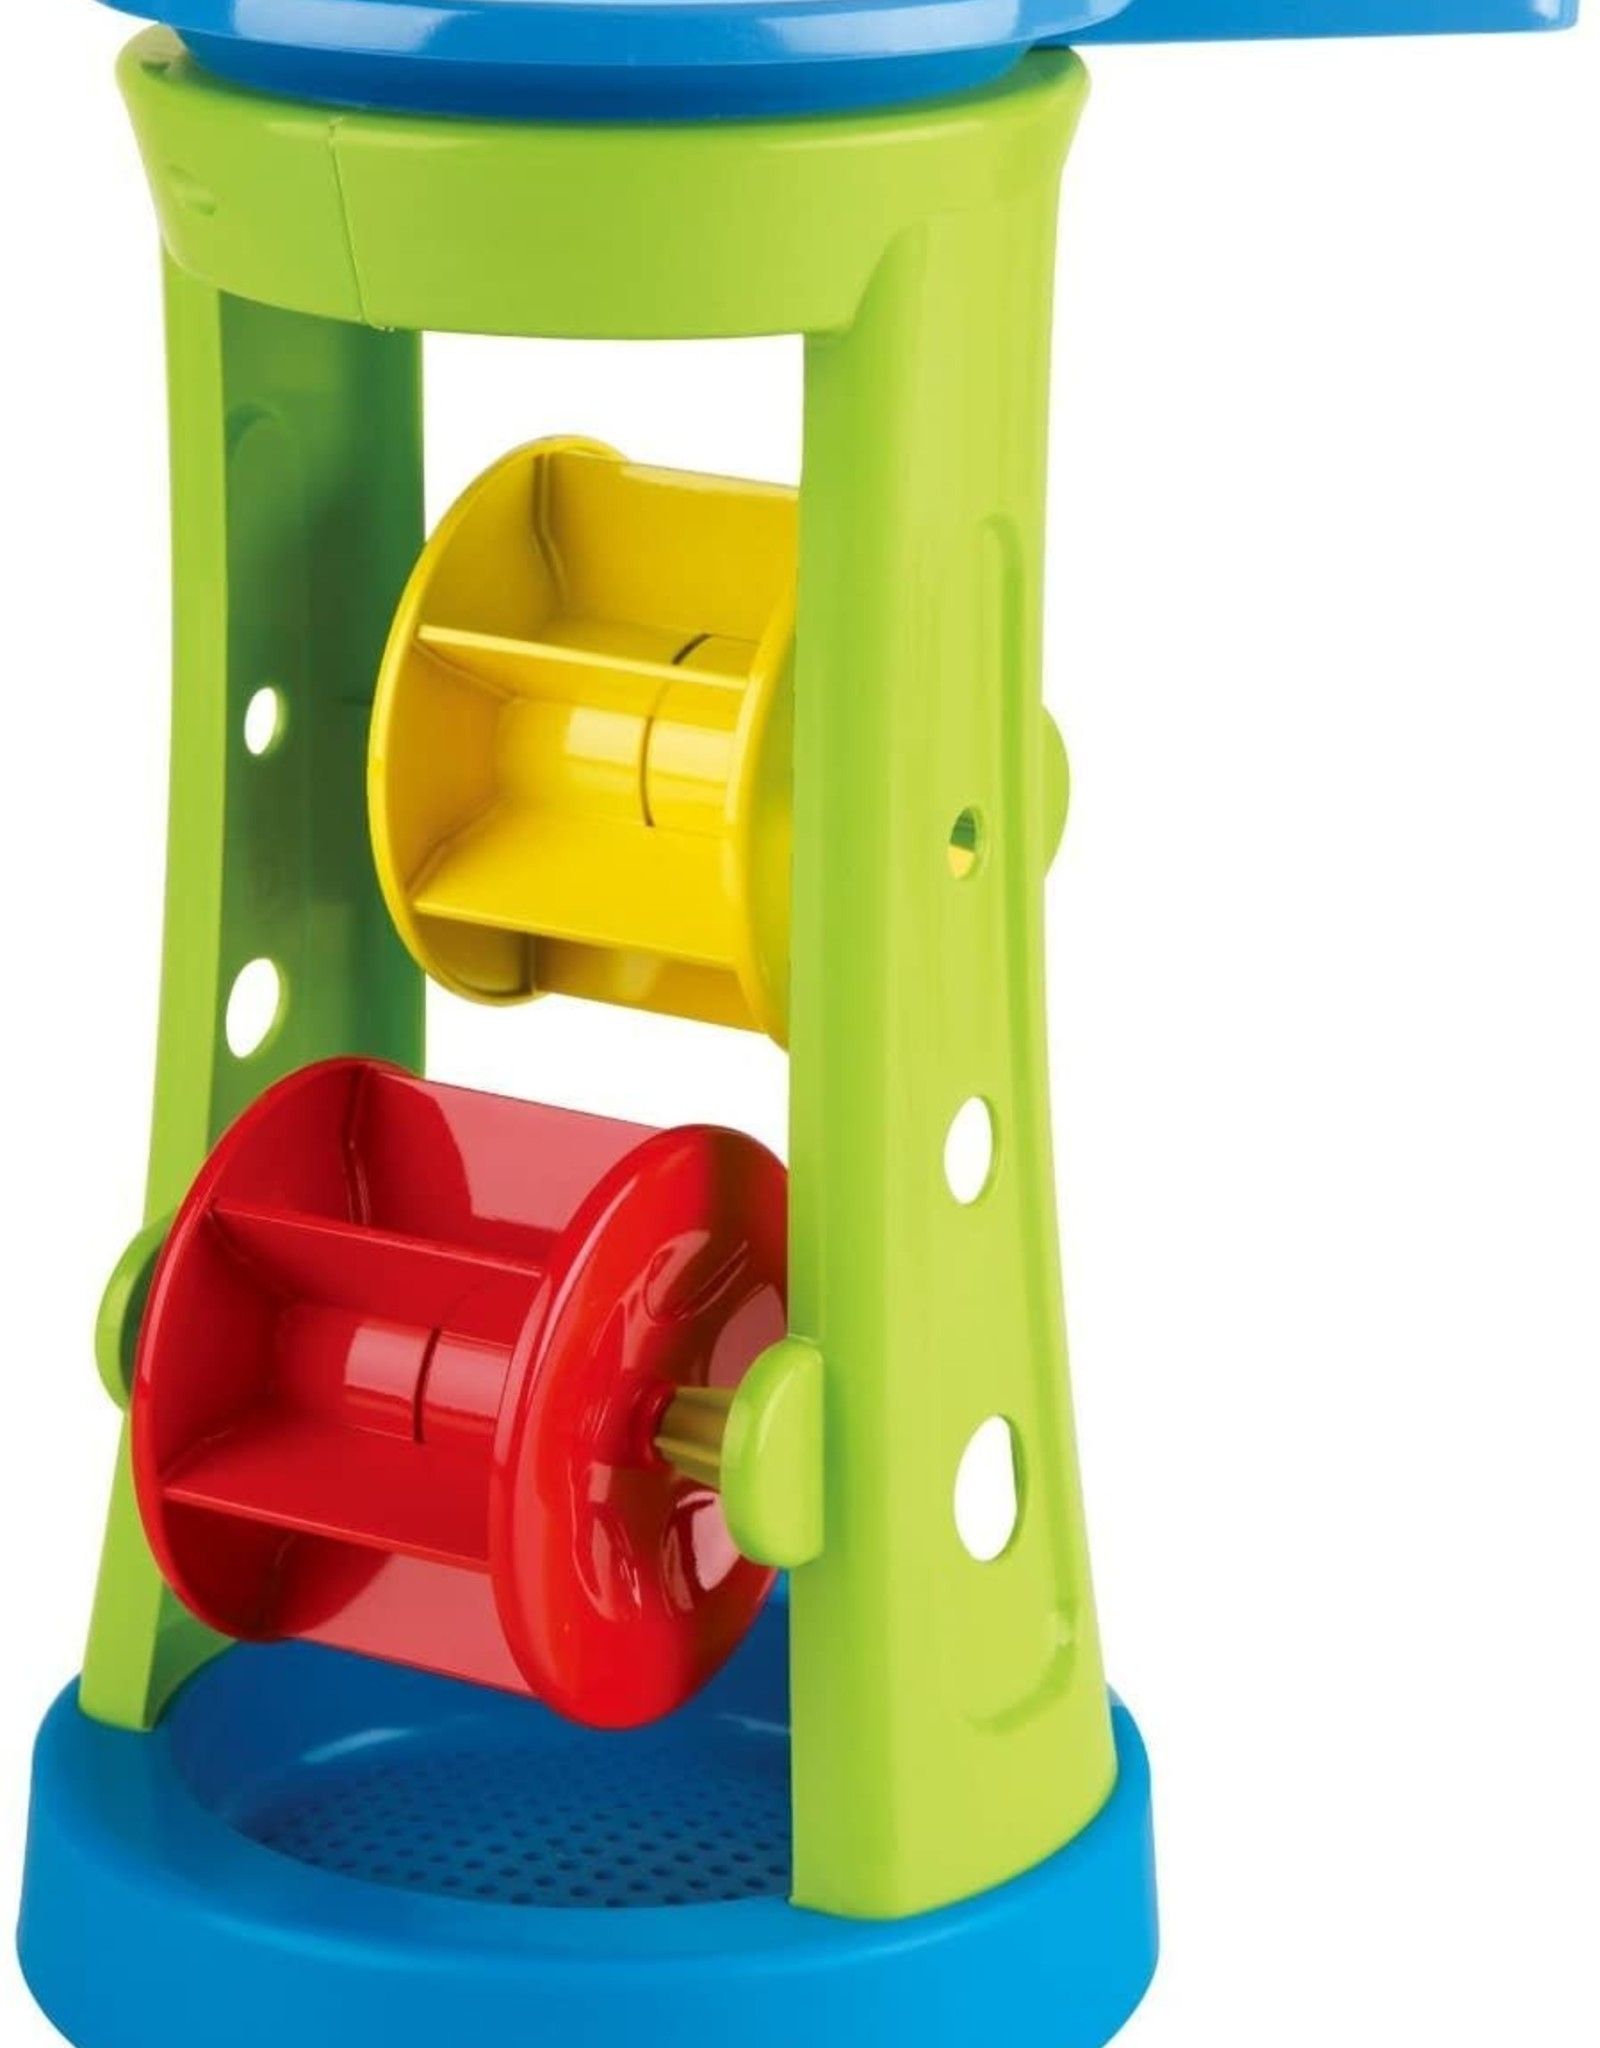 Hape Toys Double Sand & Water Wheel